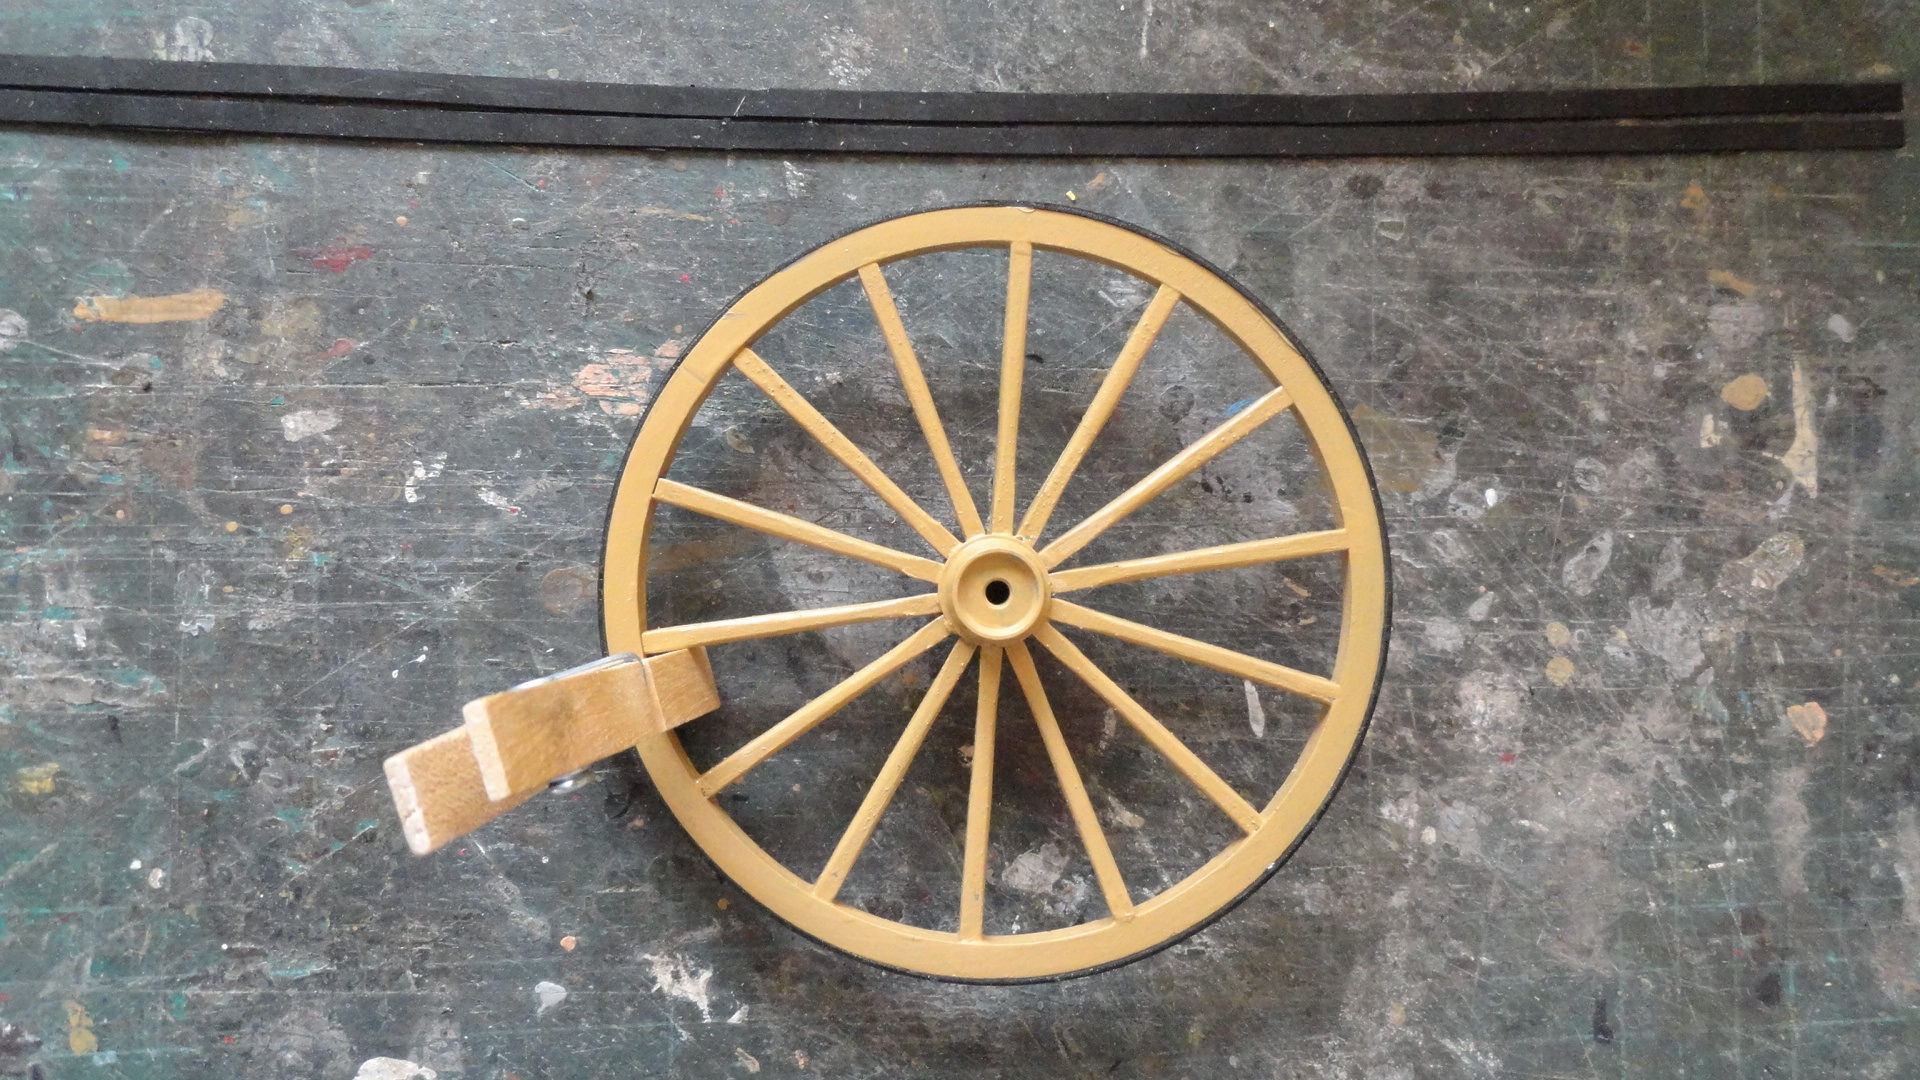 tyring_the_wheel_c_urwqwv.jpg